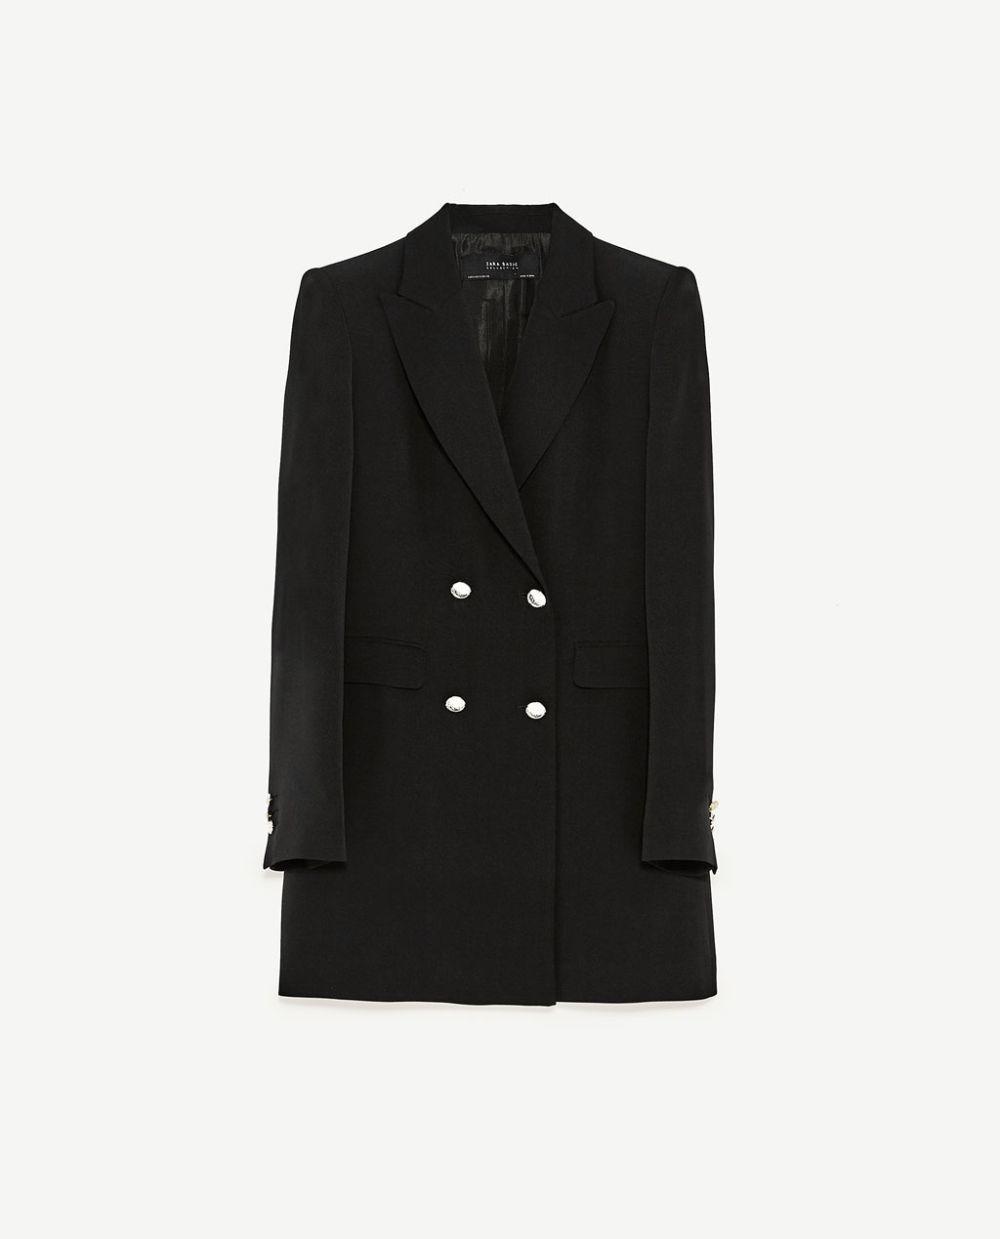 Blazer cruzada. De Zara (49,95 euros).